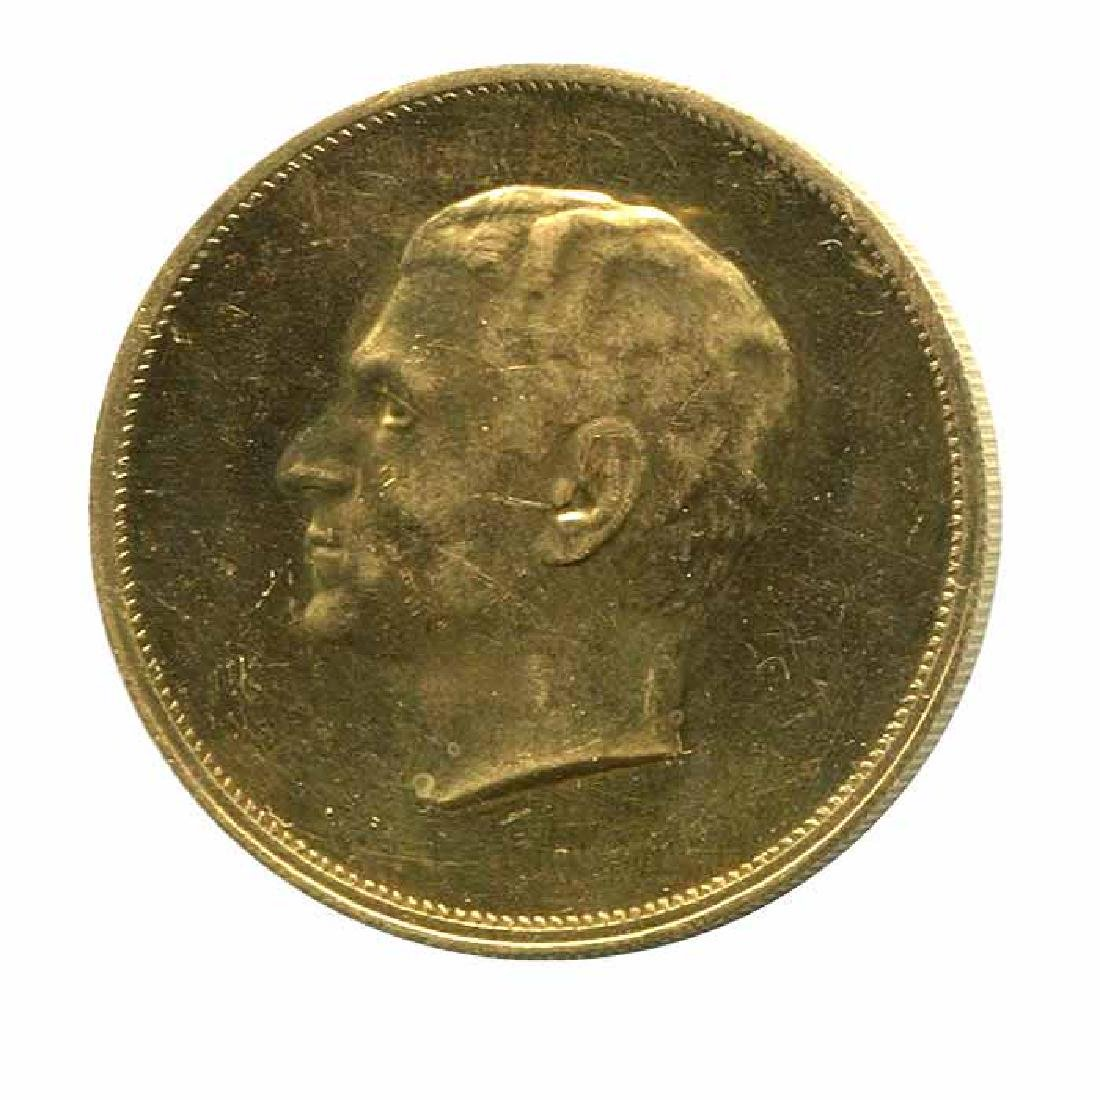 Iran Gold Medal Muhammad Reza Shah Pahlavi 1965 34.7g